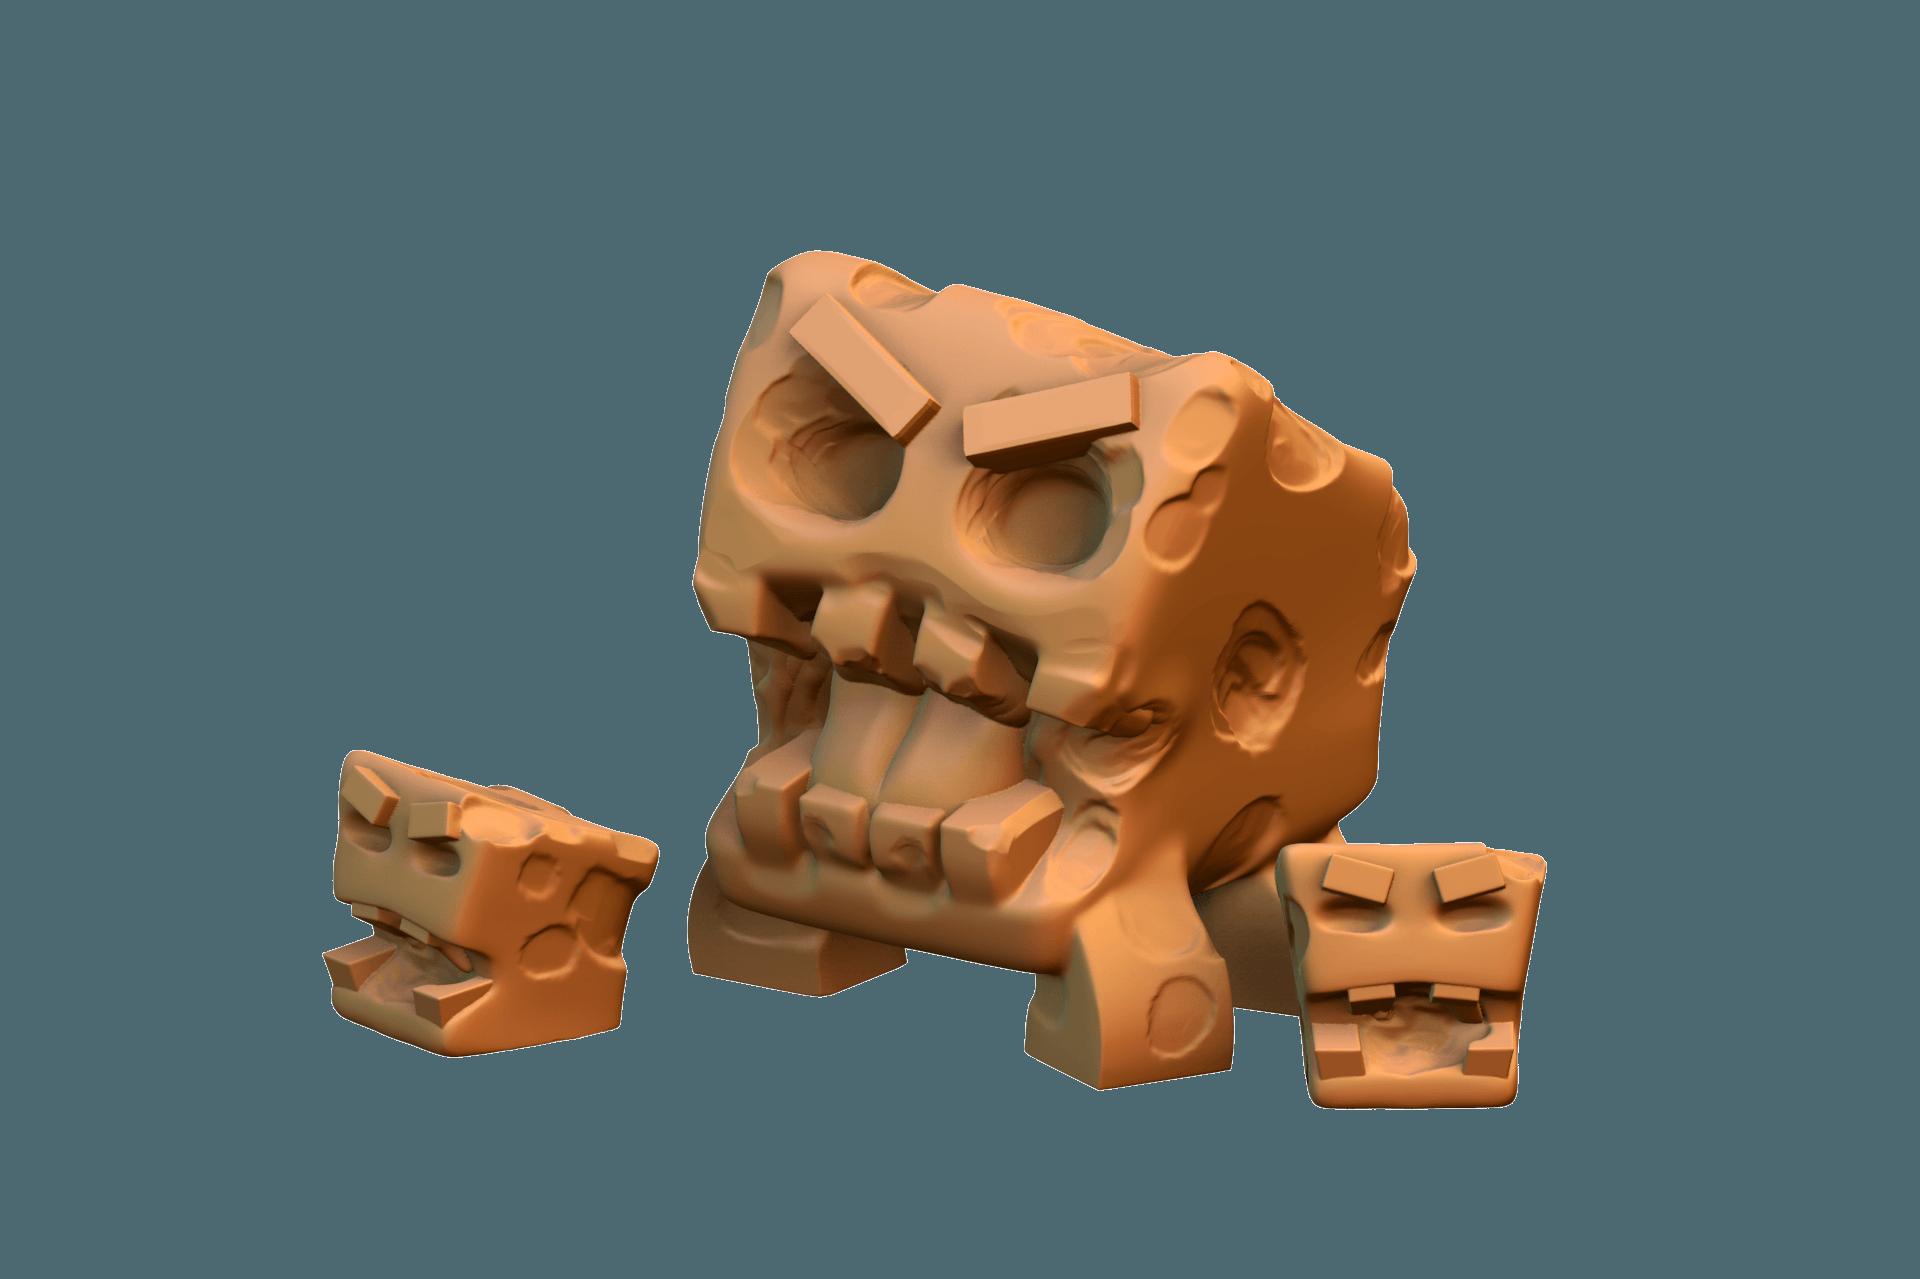 untitled.777.png Download free STL file Tofu Monsters • 3D print design, HeribertoValle